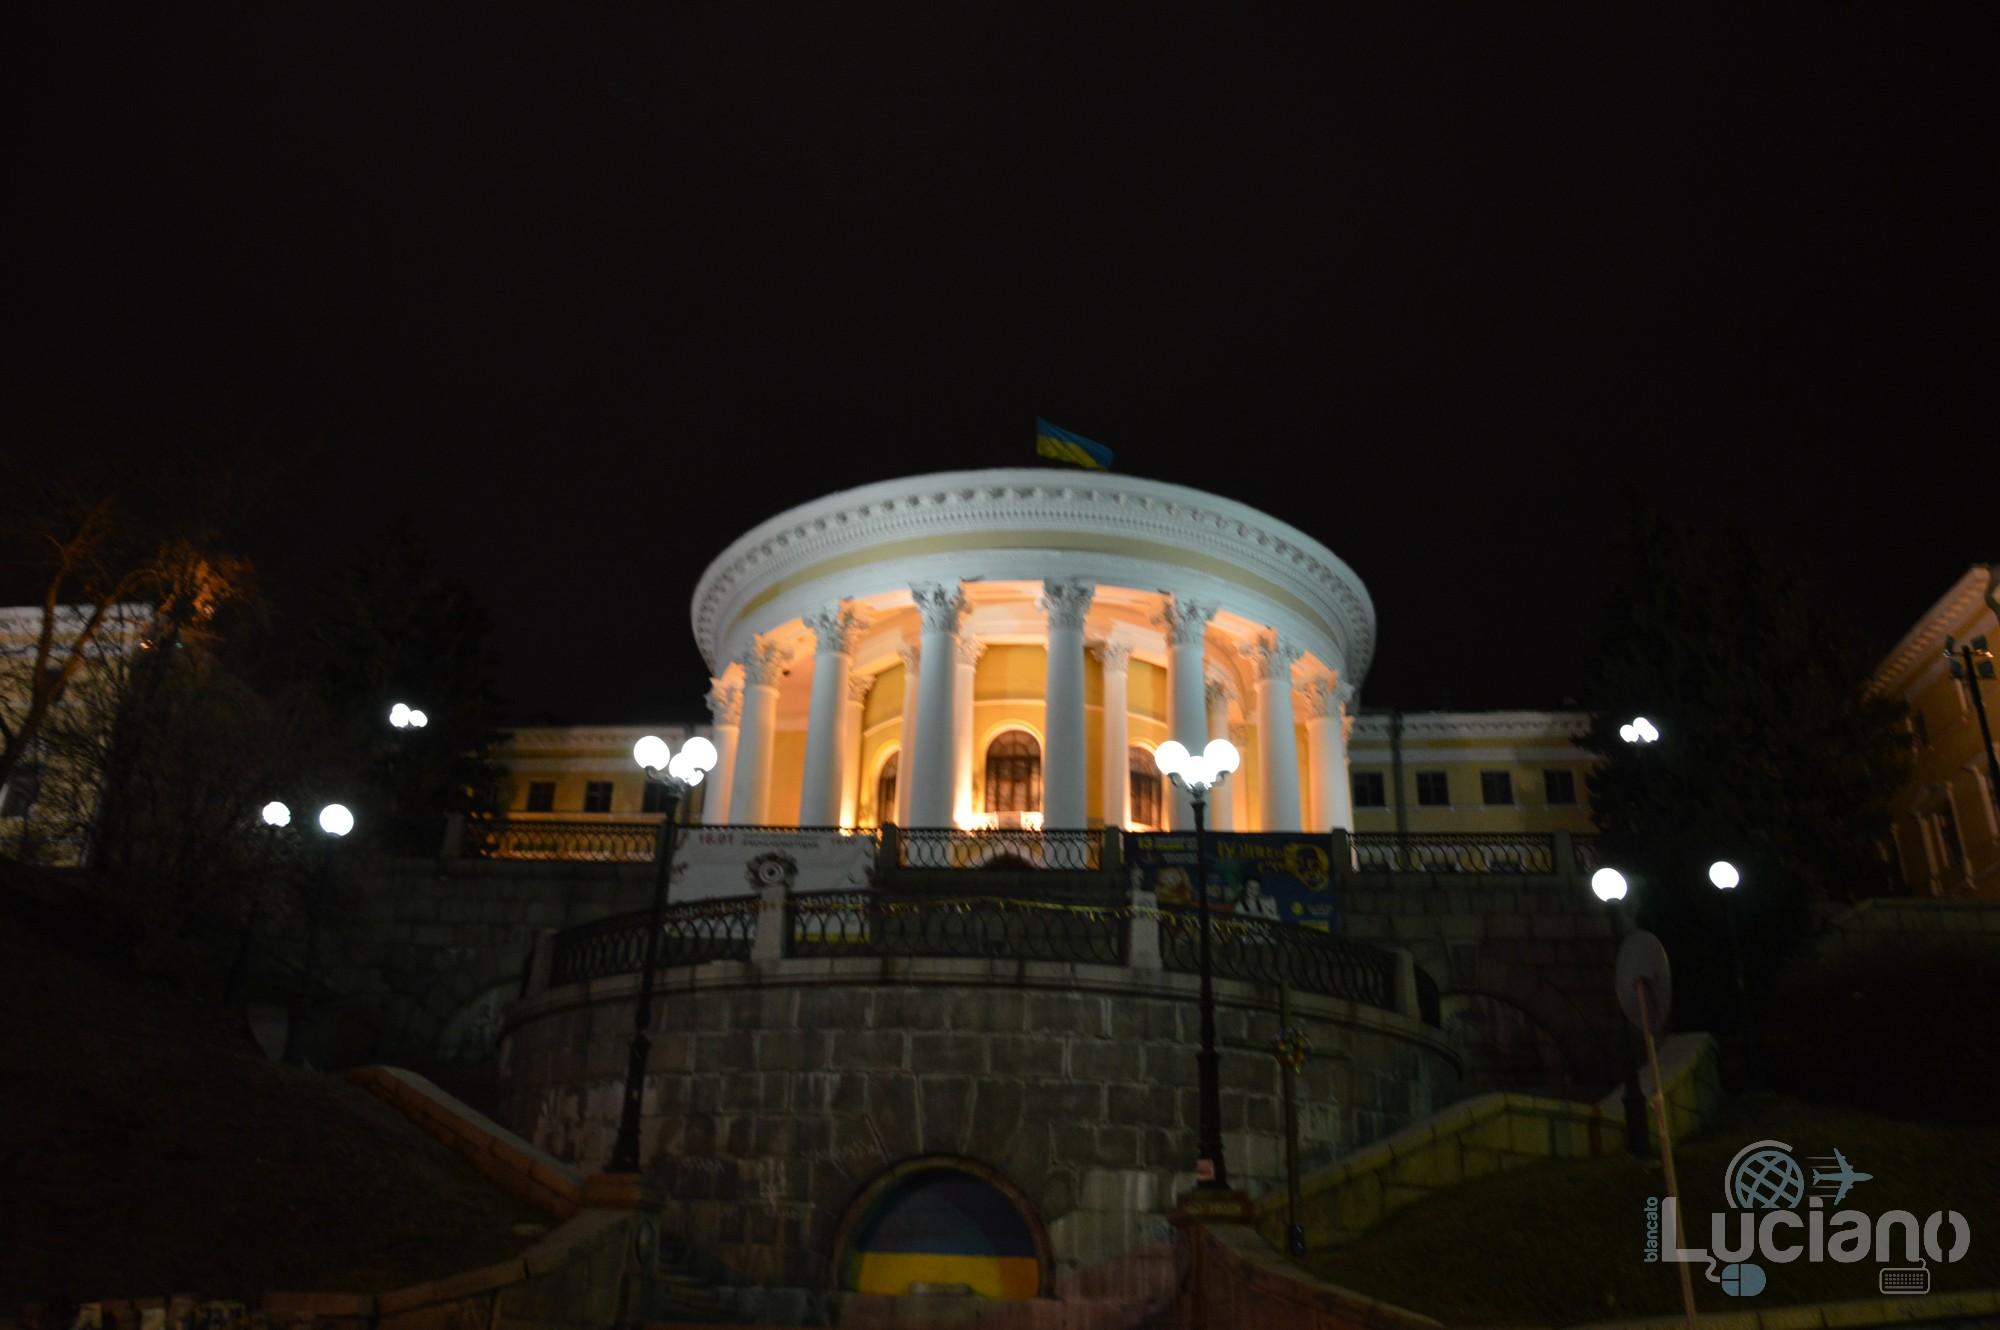 kiev-luciano-blancato-web-site (31)